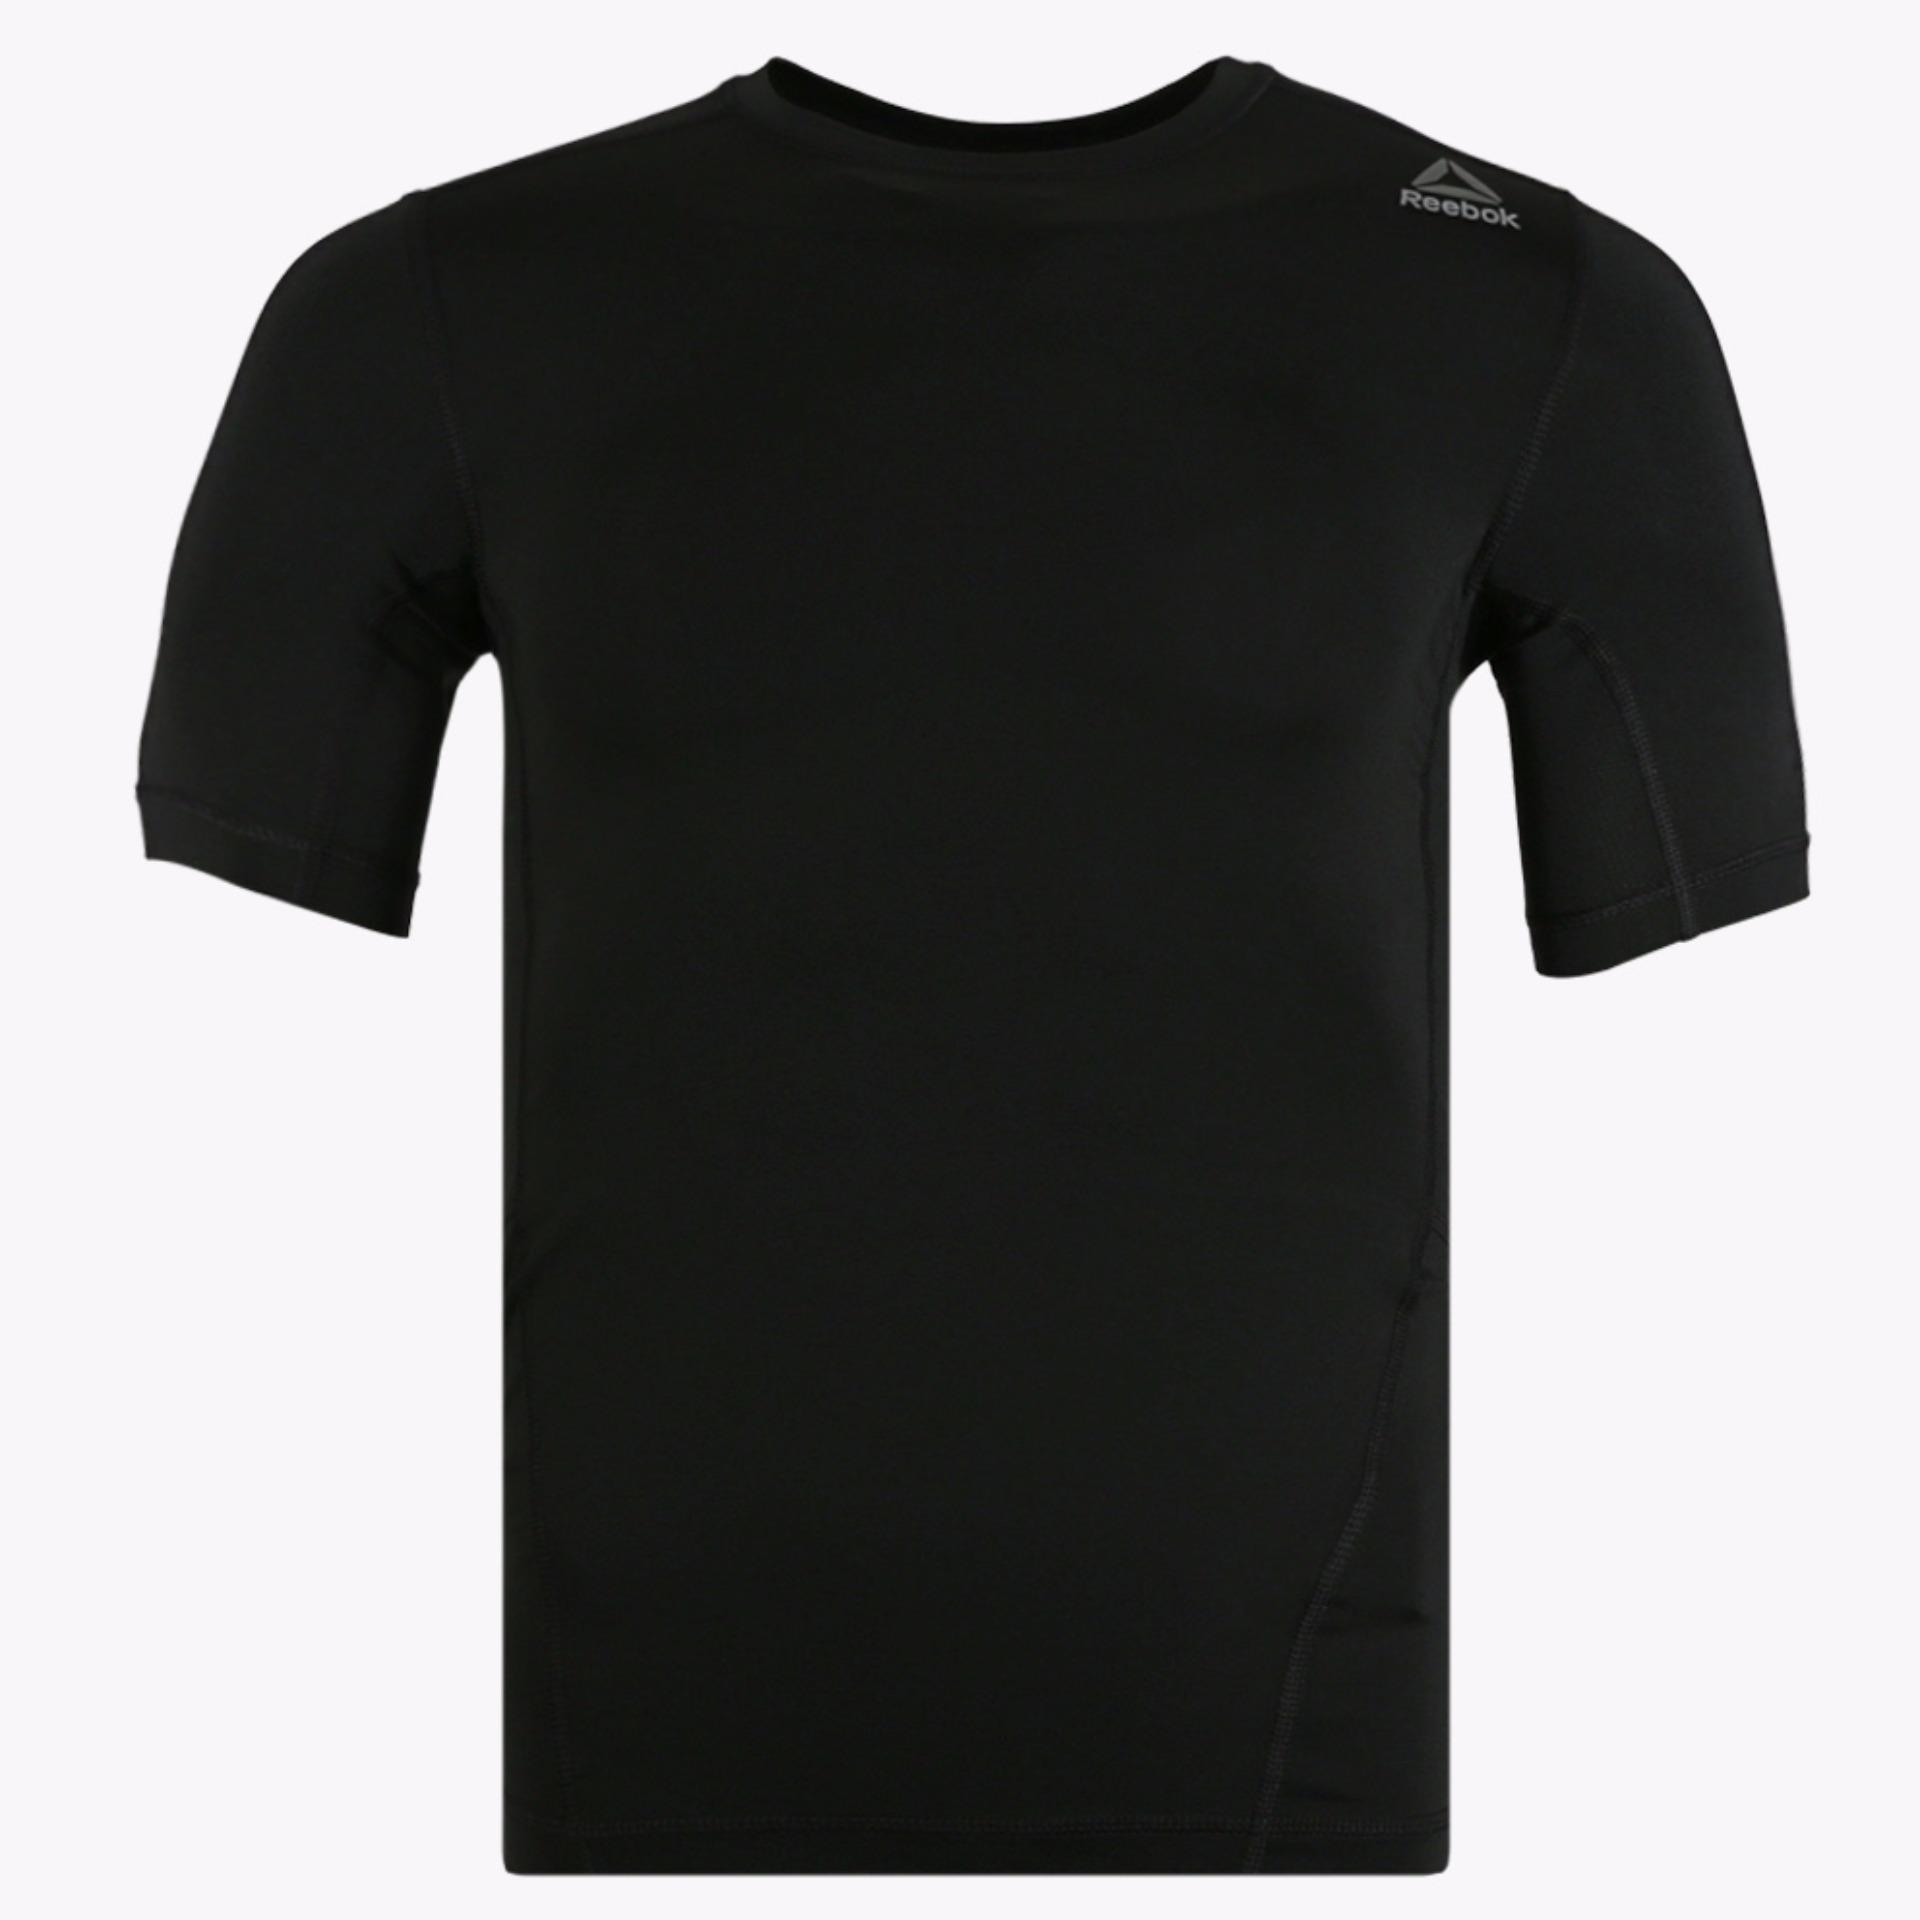 Spesifikasi Reebok Workout Ready Short Sleeve Compression Men S Tee Hitam Yang Bagus